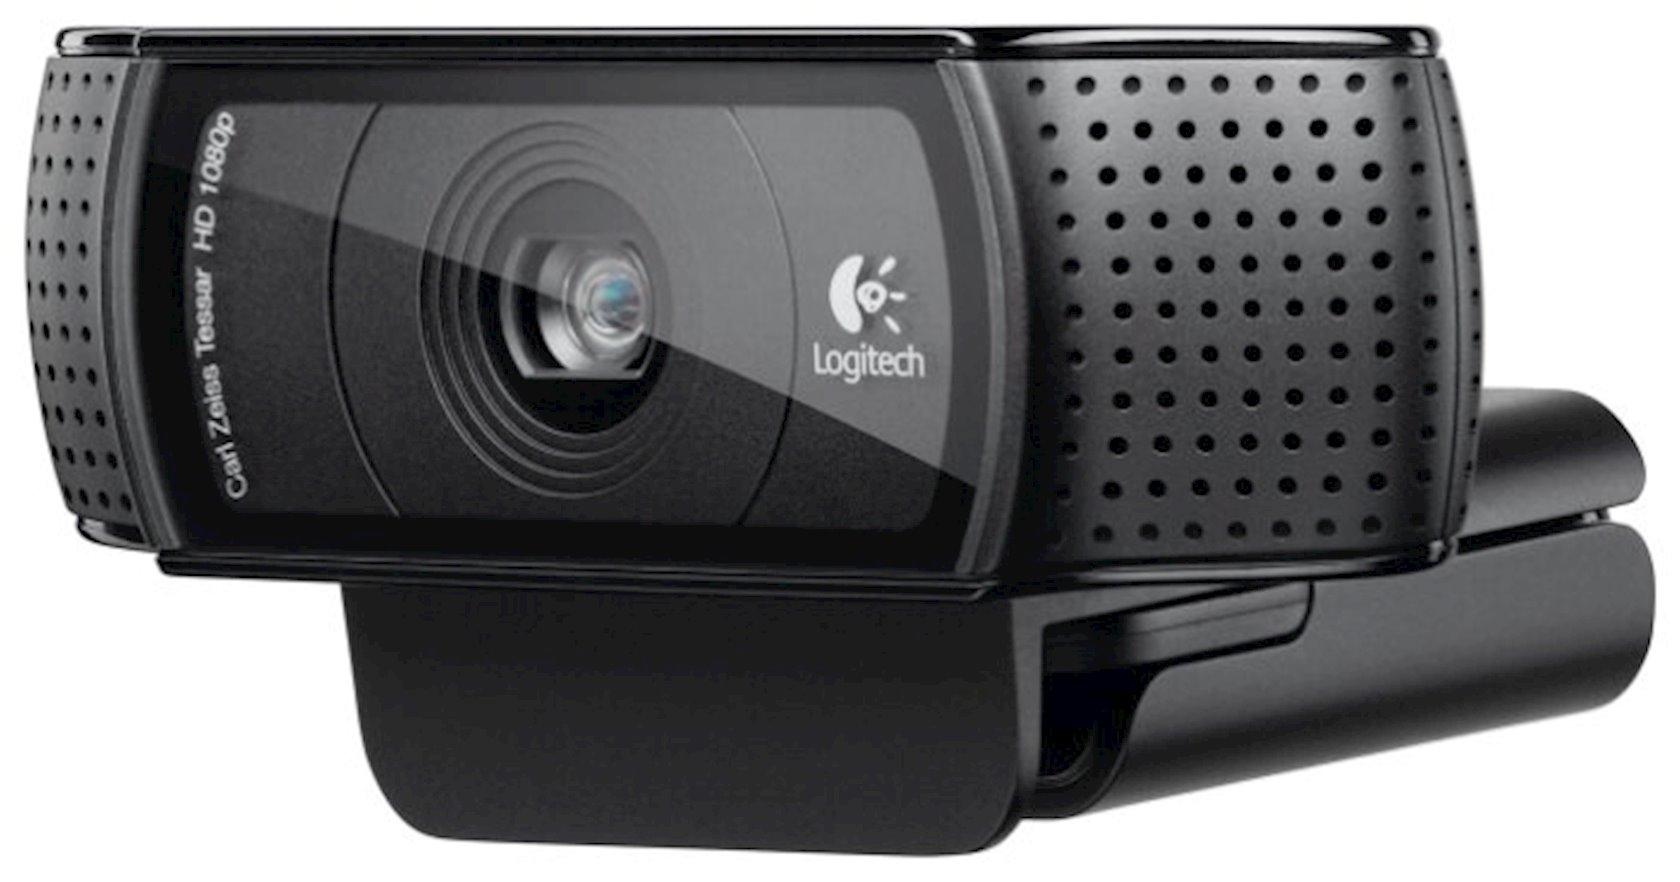 Veb-kamera Logitech HD Pro Webcam C920